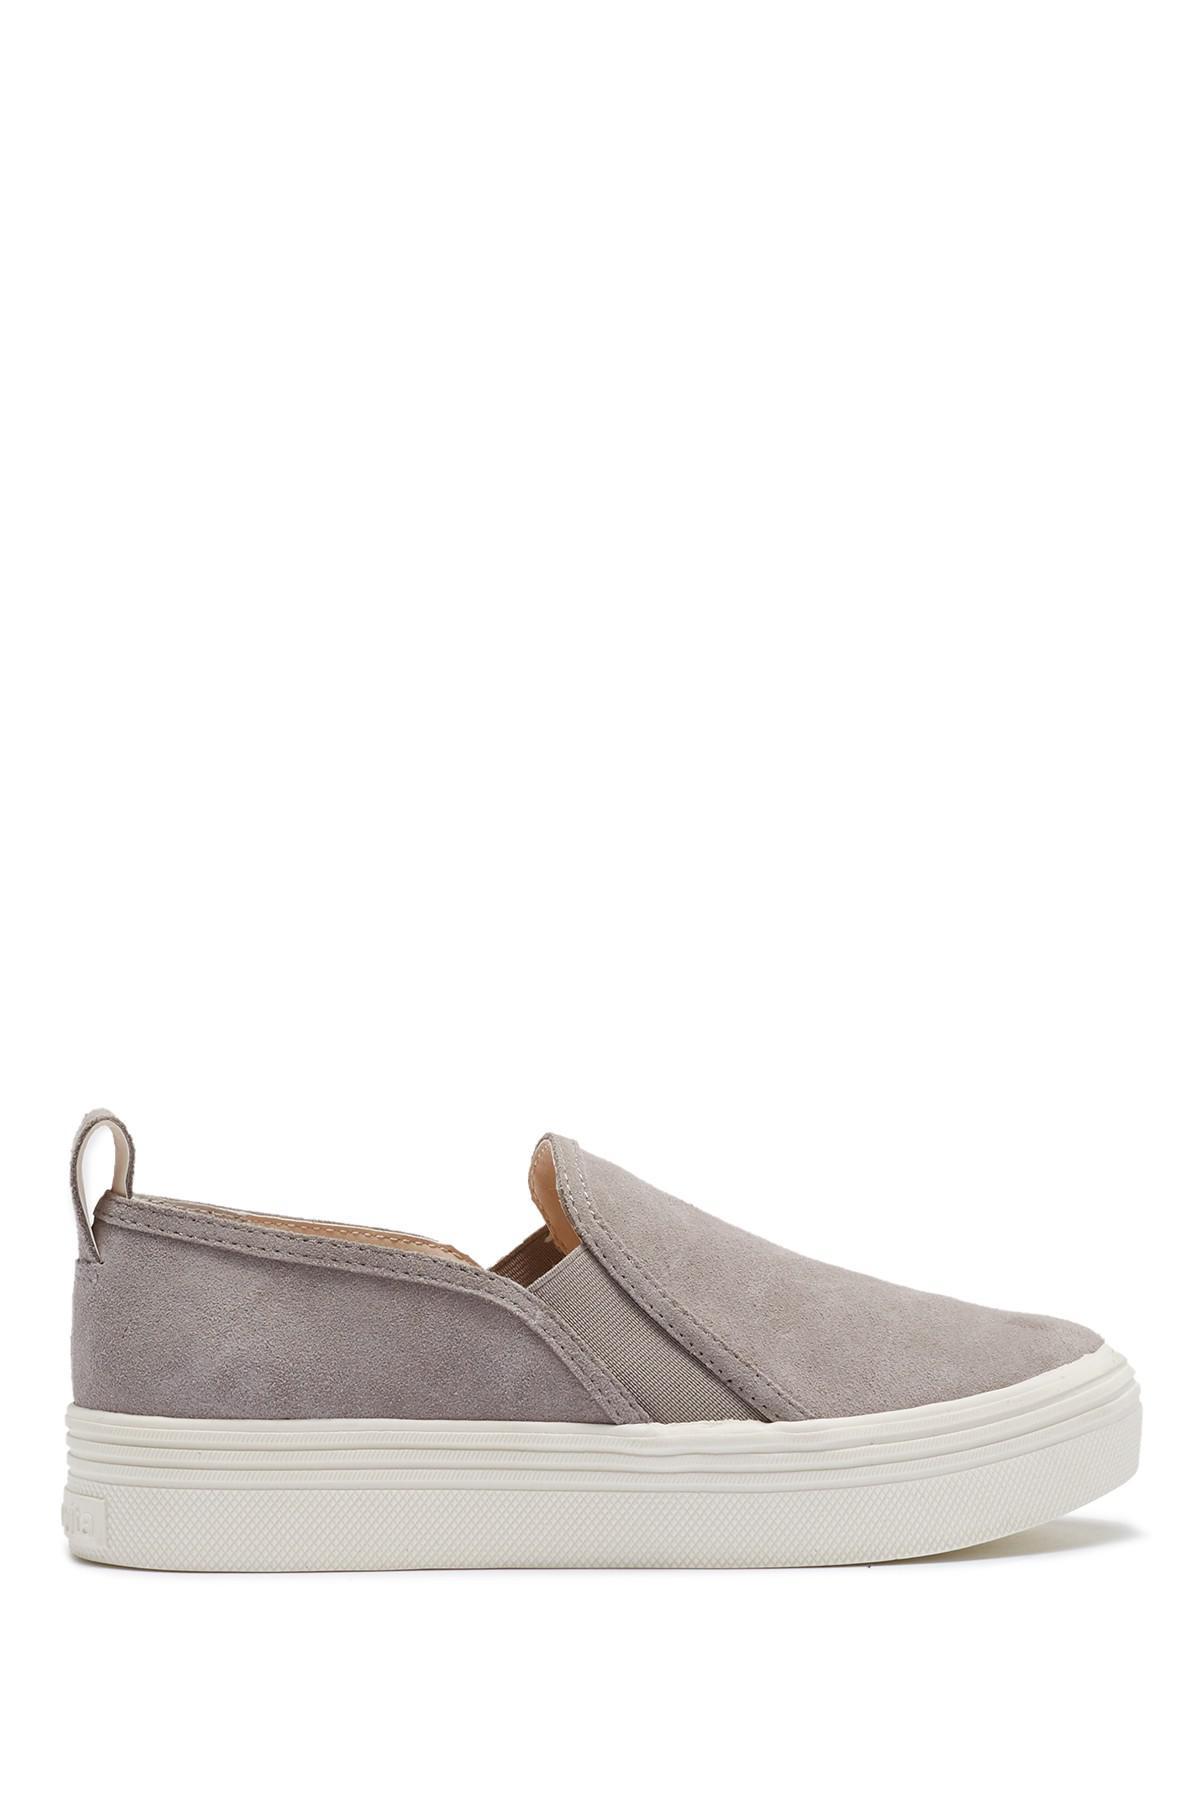 97cc4bdb5f57 Lyst - Dolce Vita Tannis Double Gored Platform Sneaker in Gray